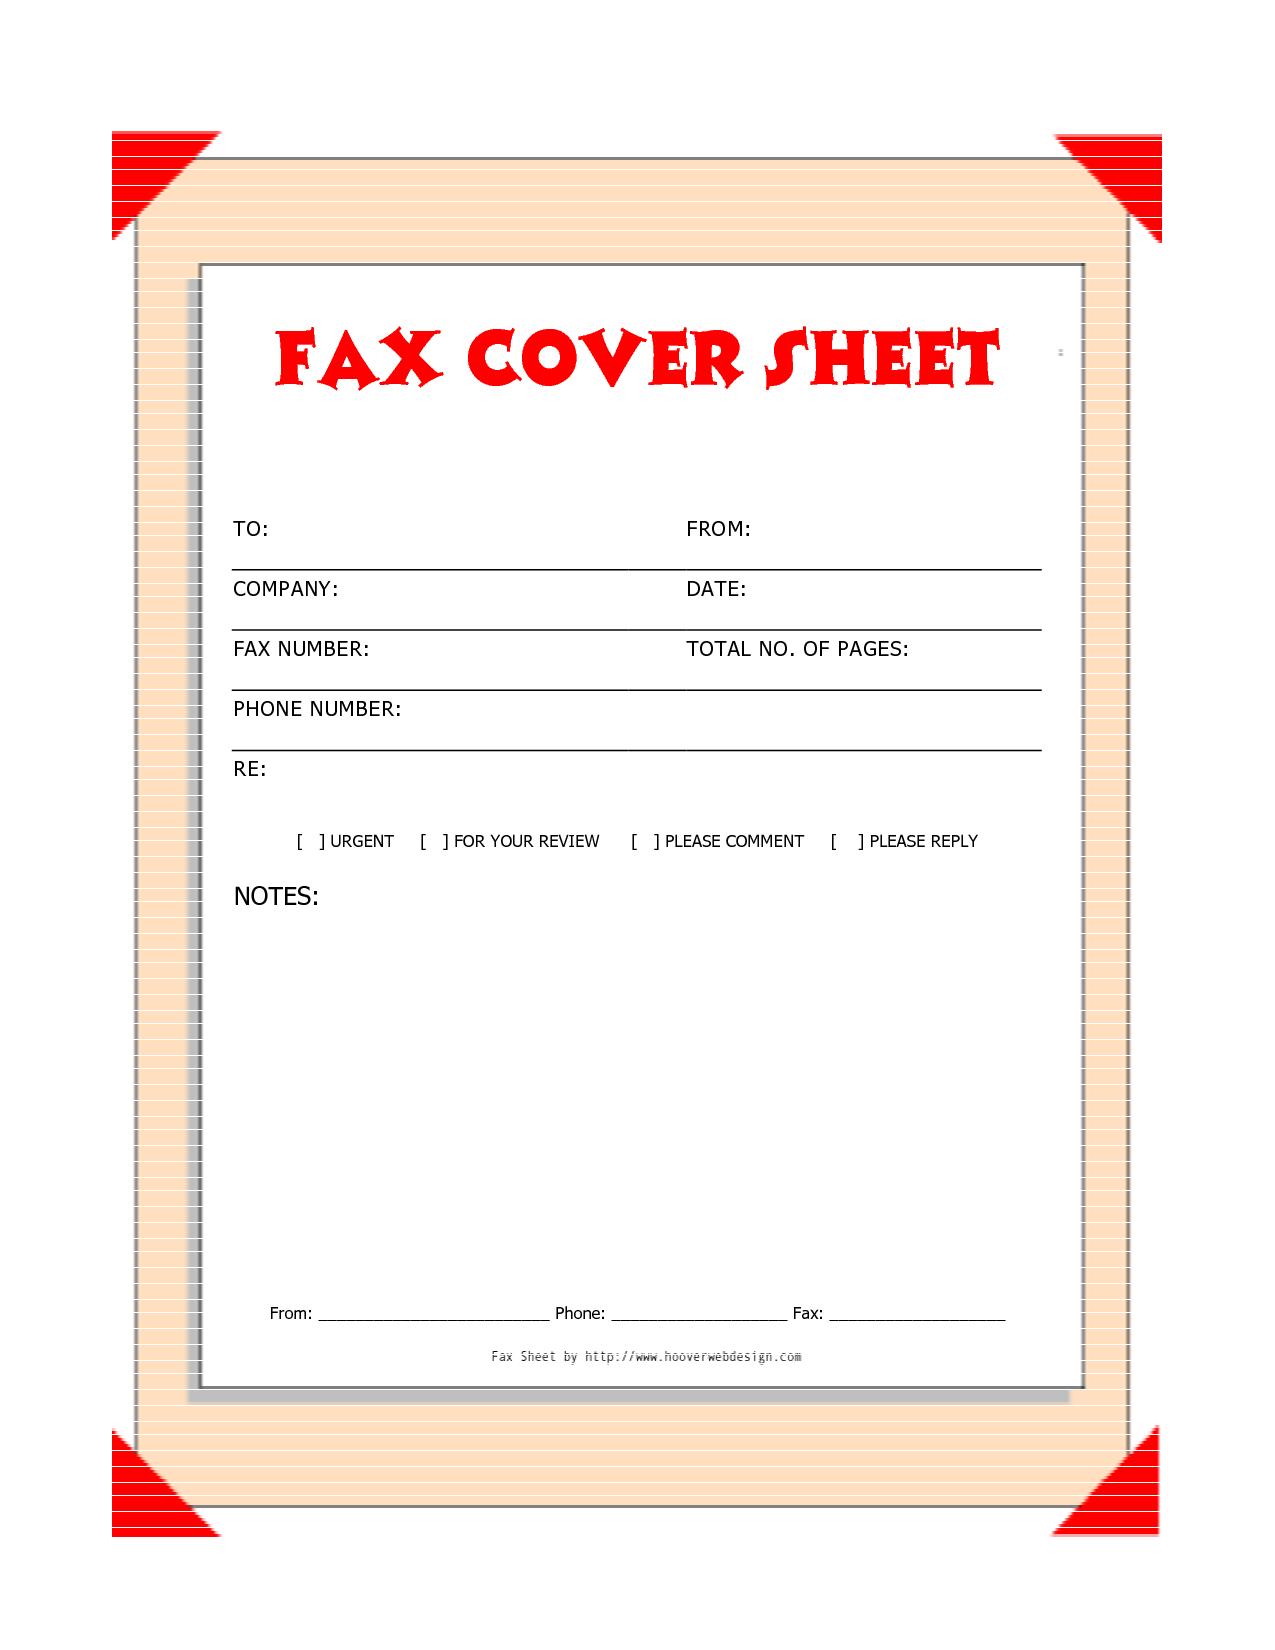 basic fax cover sheet template | datariouruguay